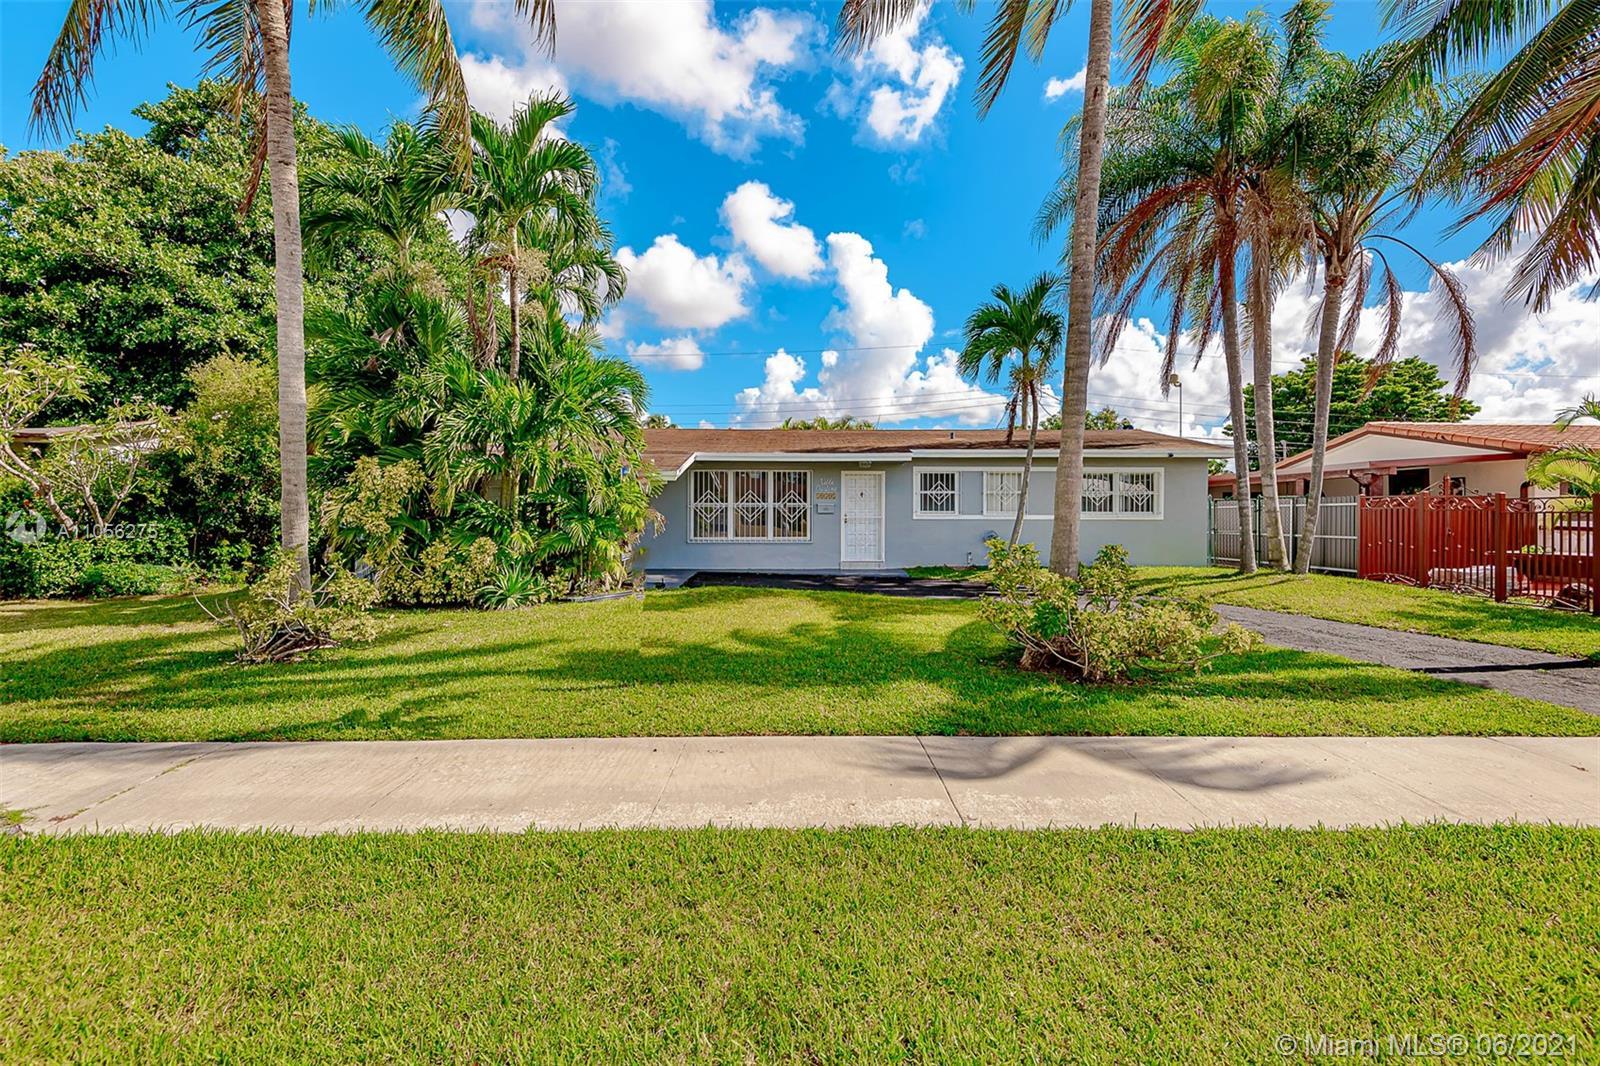 Heftler Homes - 10501 SW 46th Ter, Miami, FL 33165